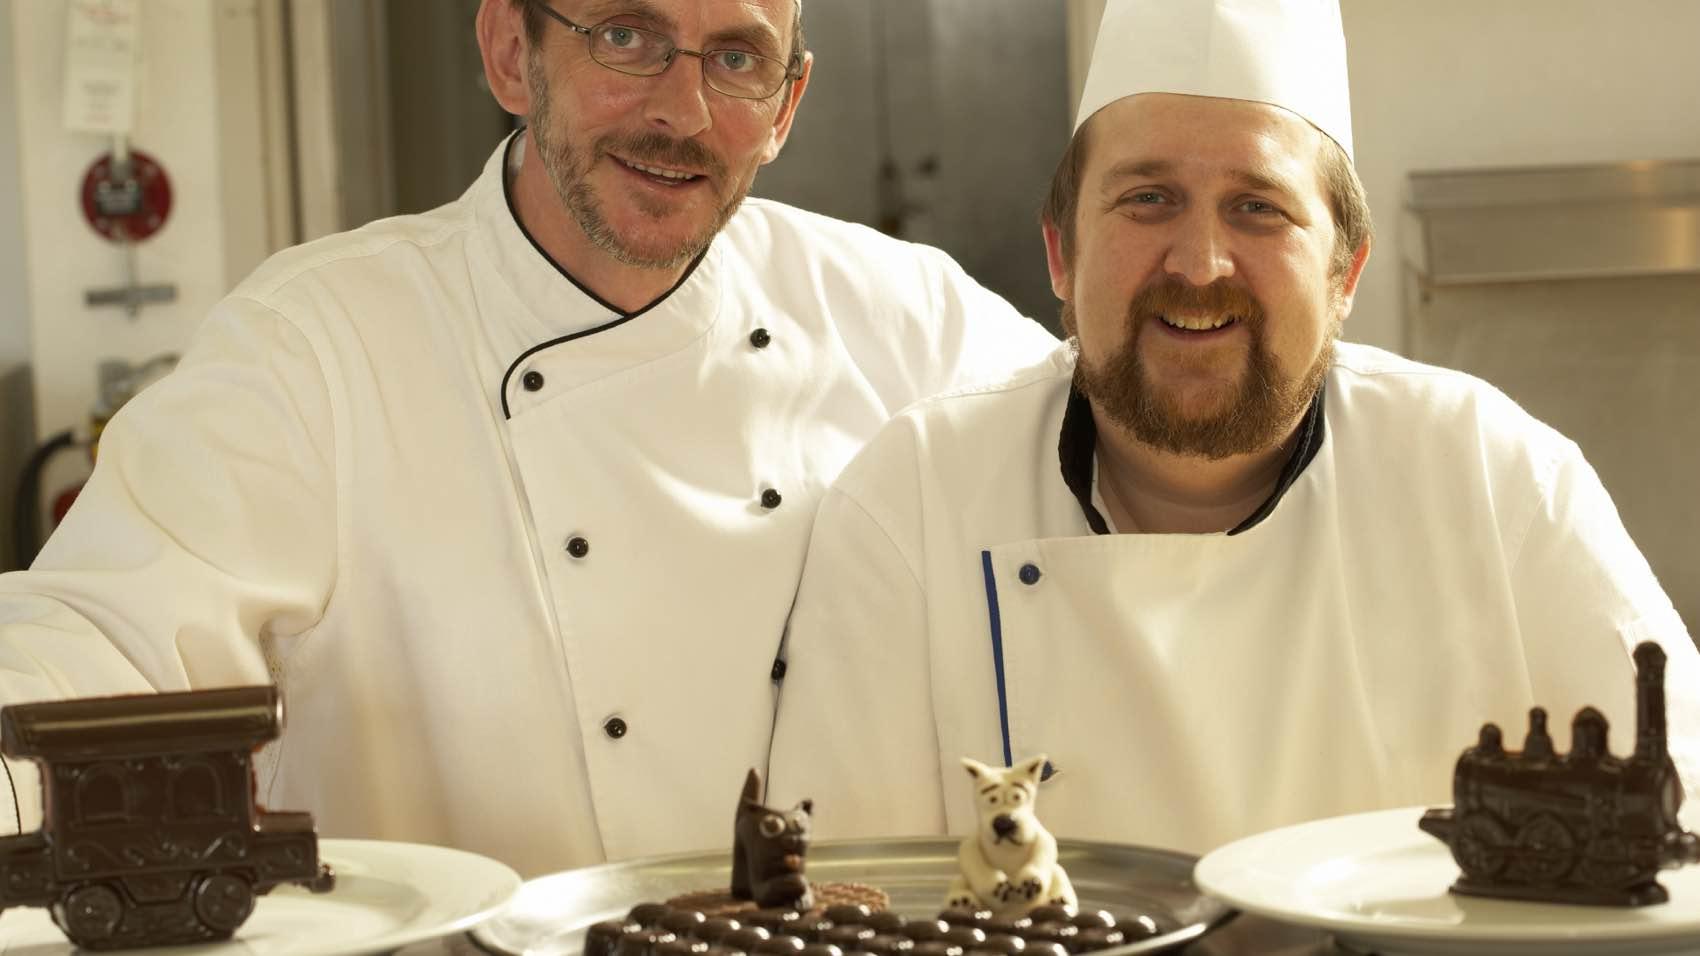 Men at work: Two cake Decorists